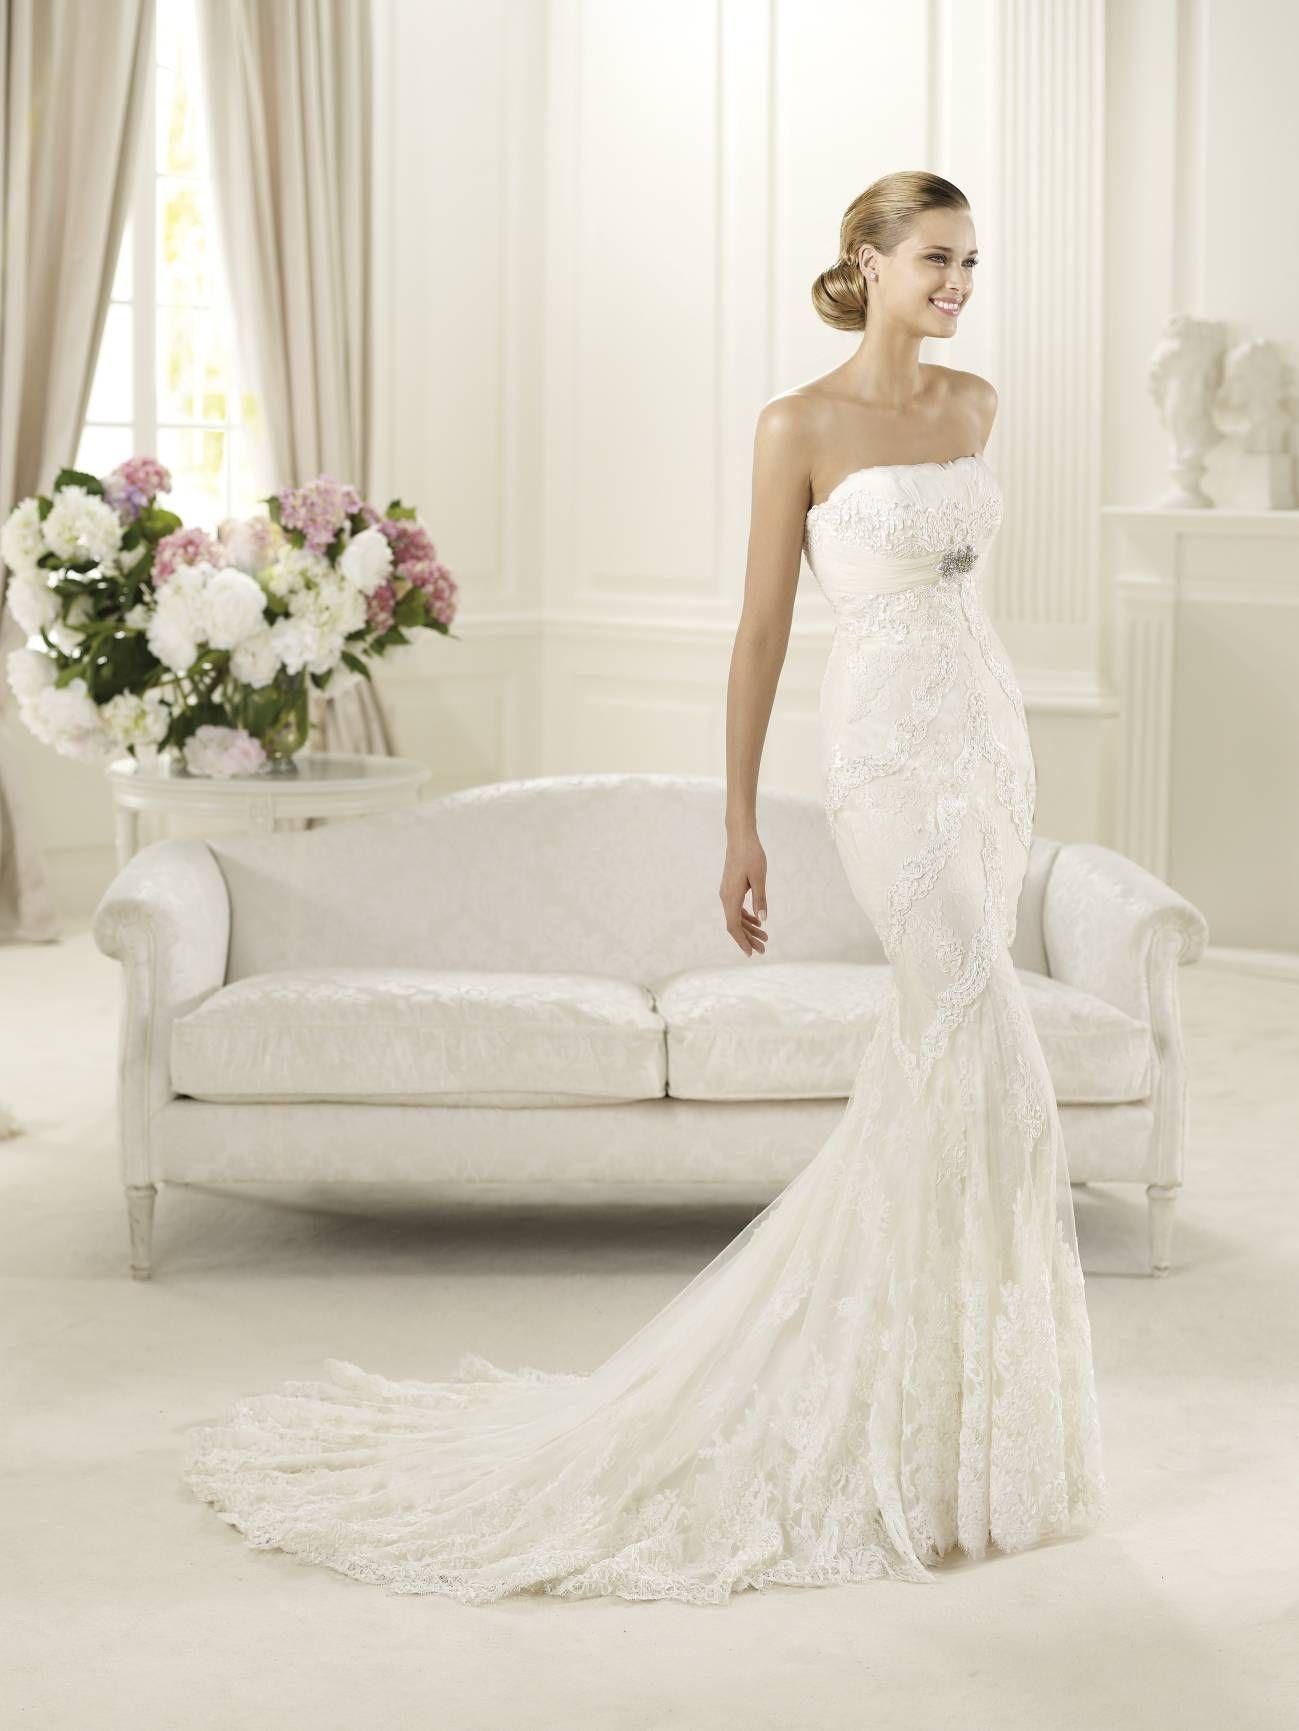 Preloved pronovias wedding dresses  Dietrich esküvői ruha lamarieeeskuvoiruhapronovias